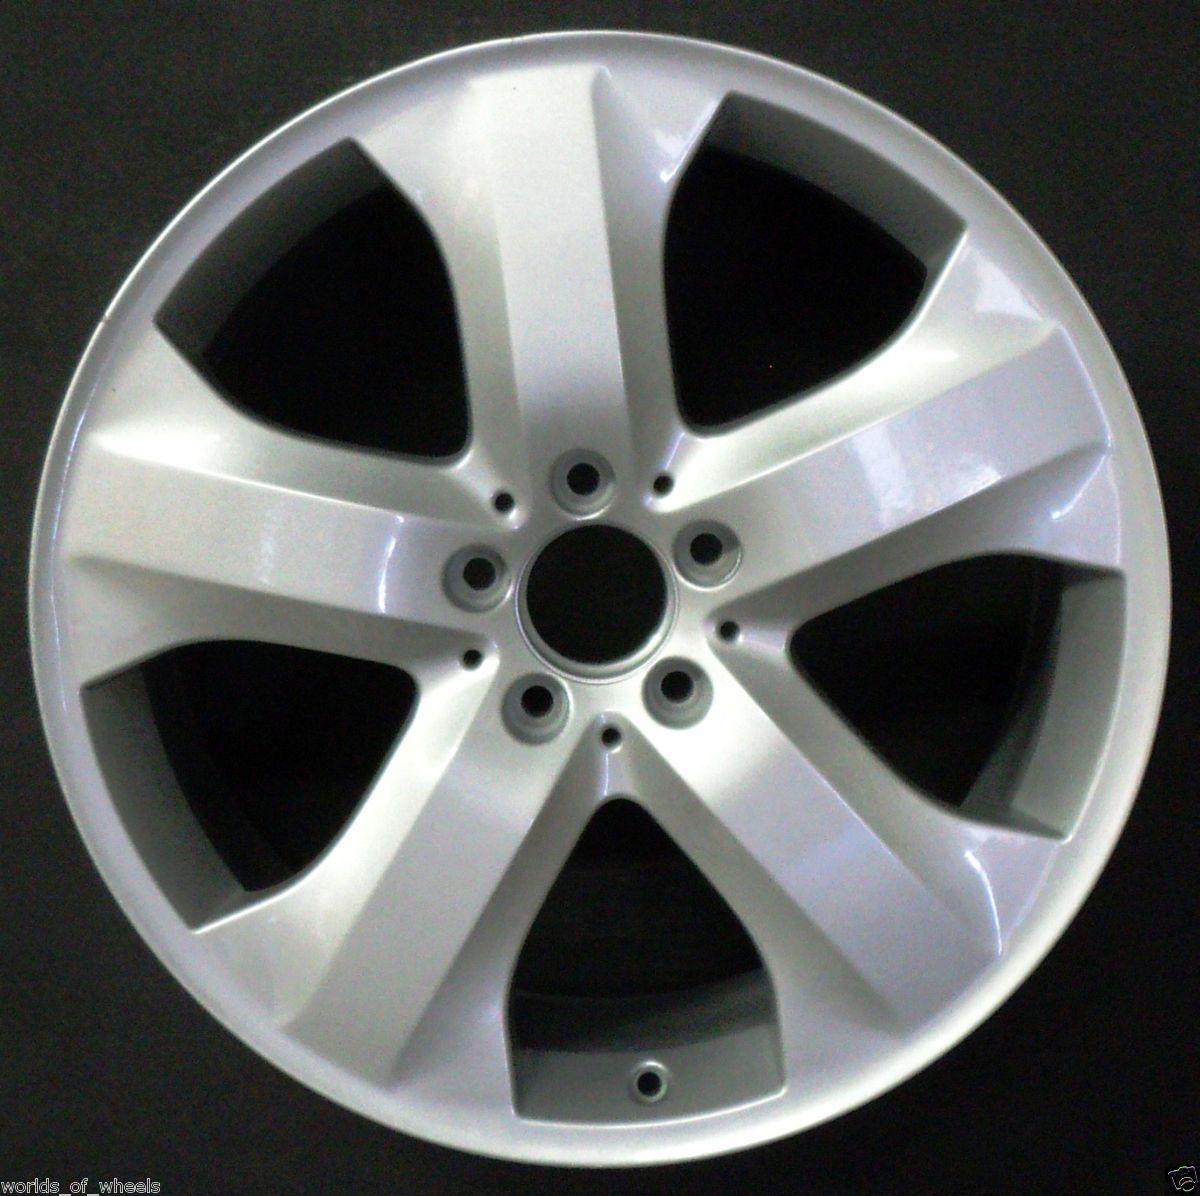 2012 Mercedes GL GL350 GL450 19 5 Spoke Factory OEM Wheel Rim H 85107